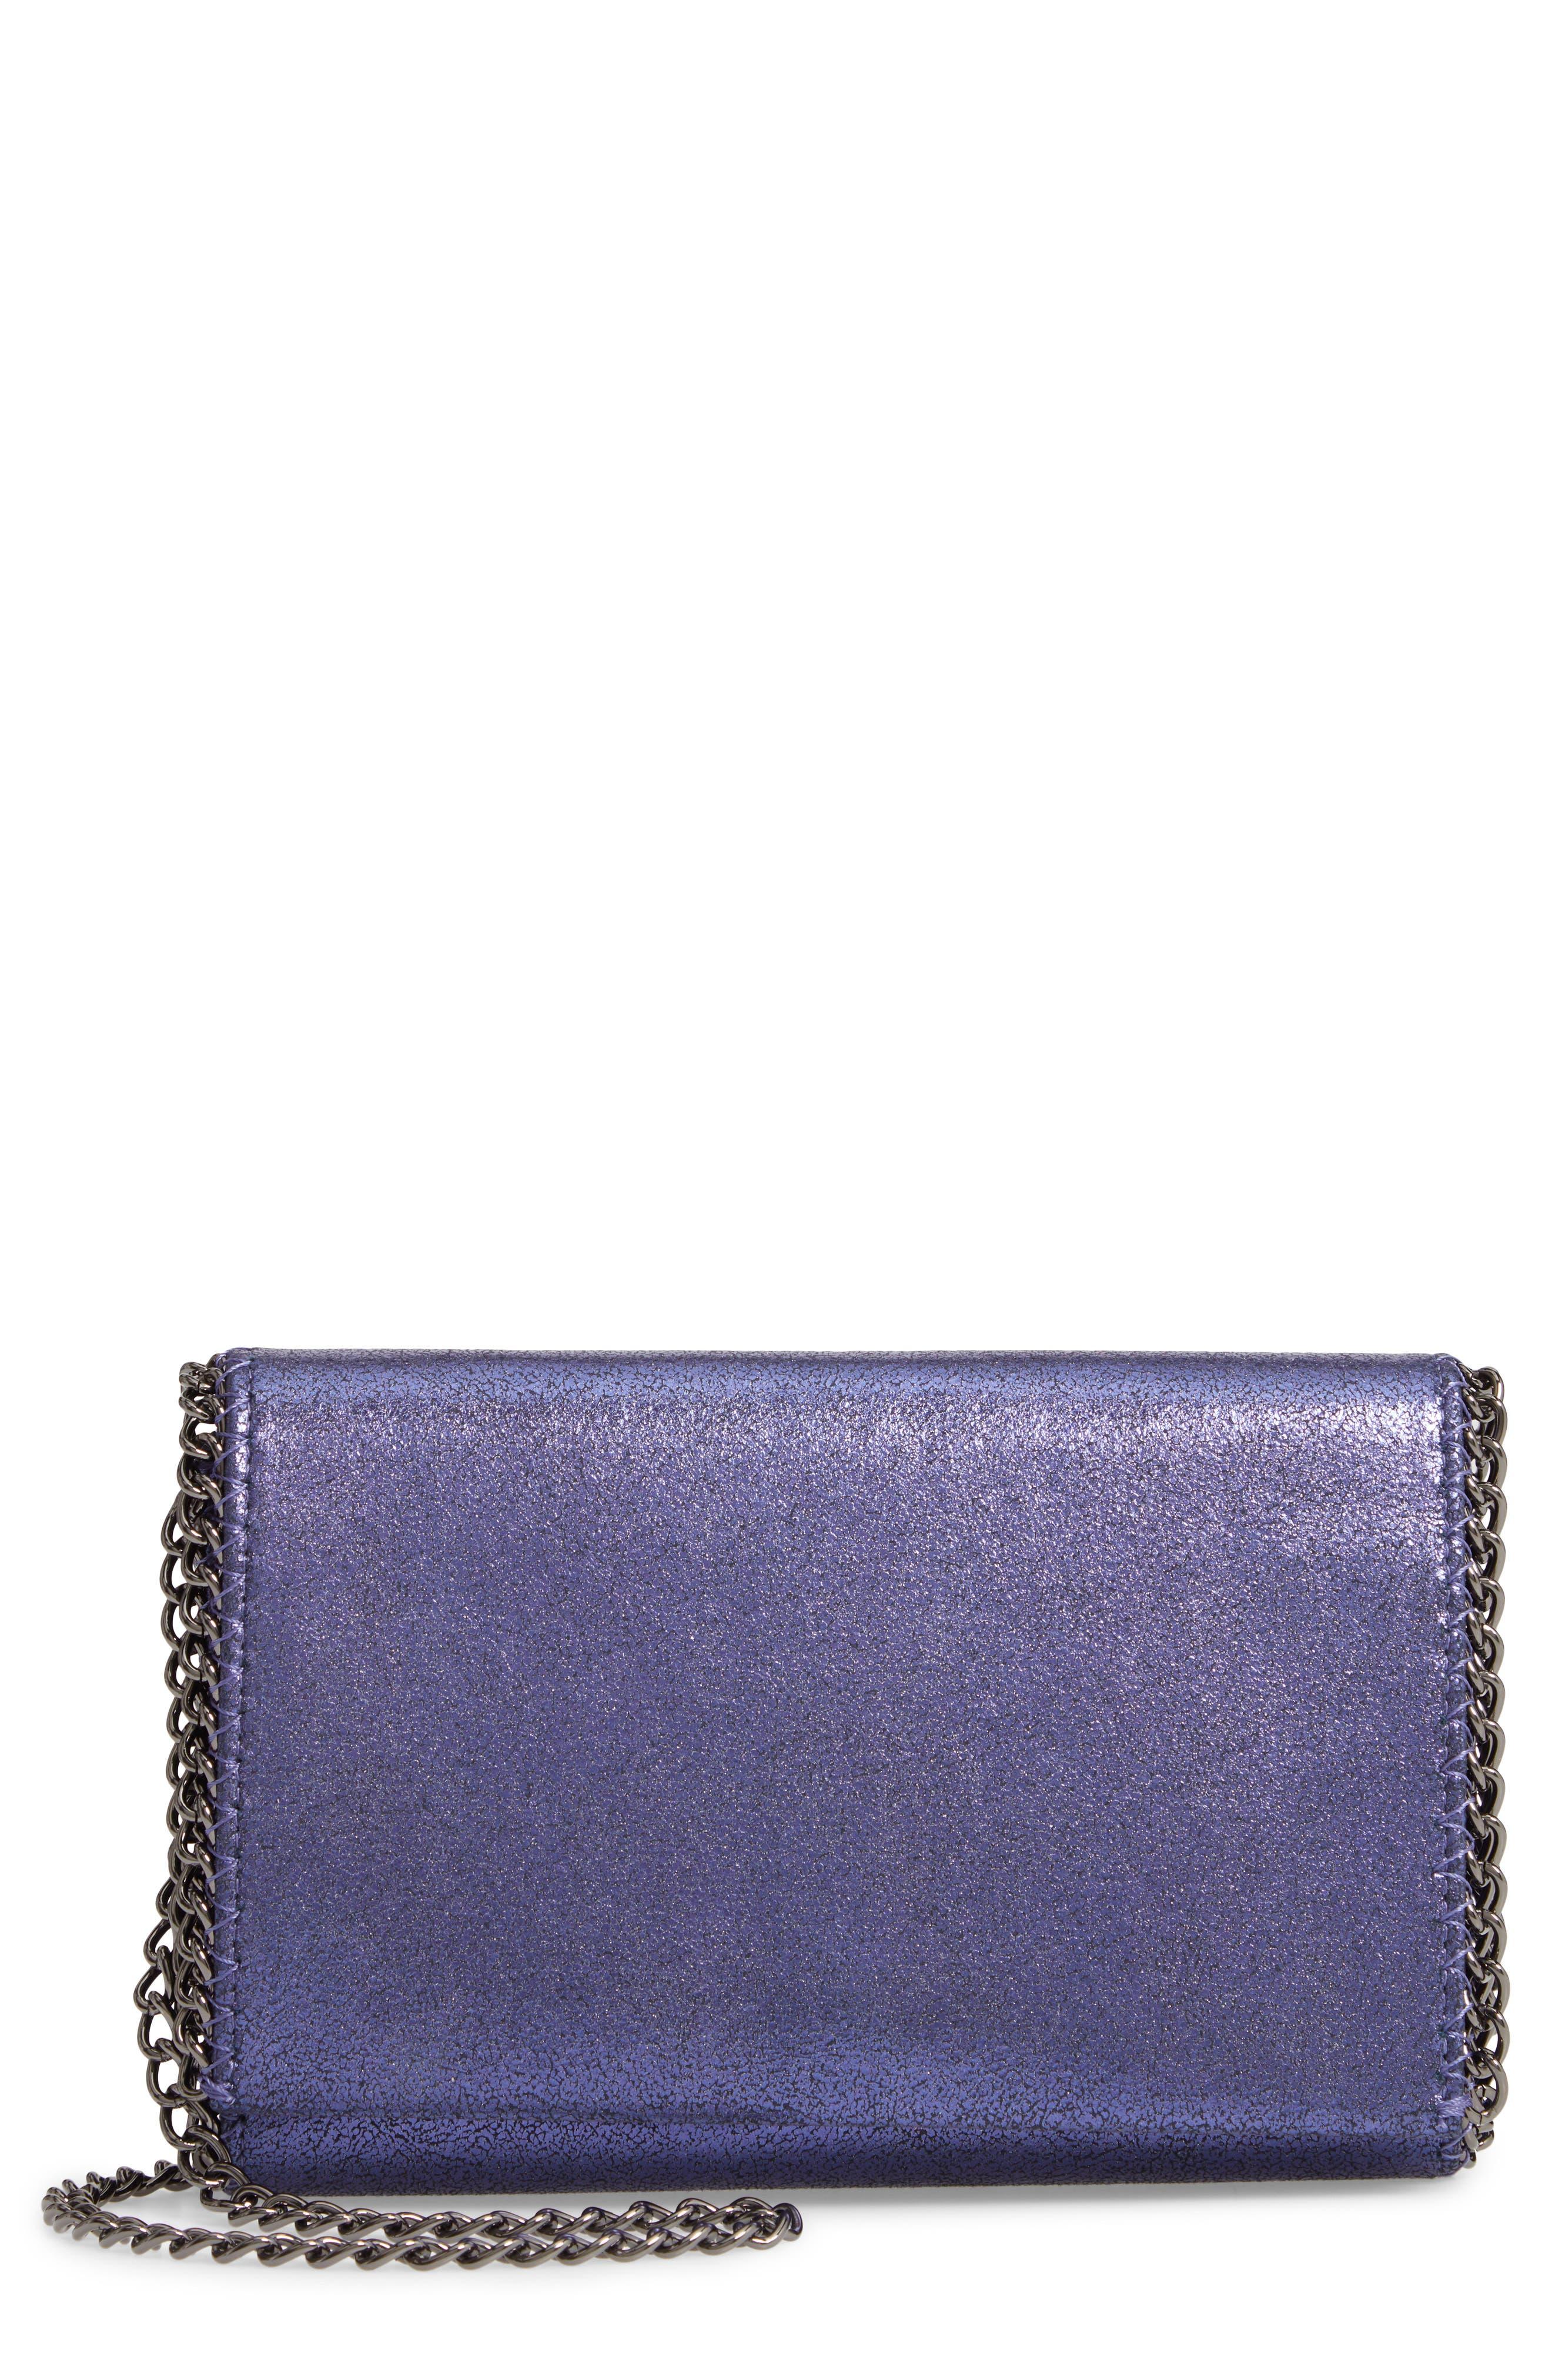 CHELSEA28 Faux Leather Wallet on a Chain, Main, color, BLUE MONACO